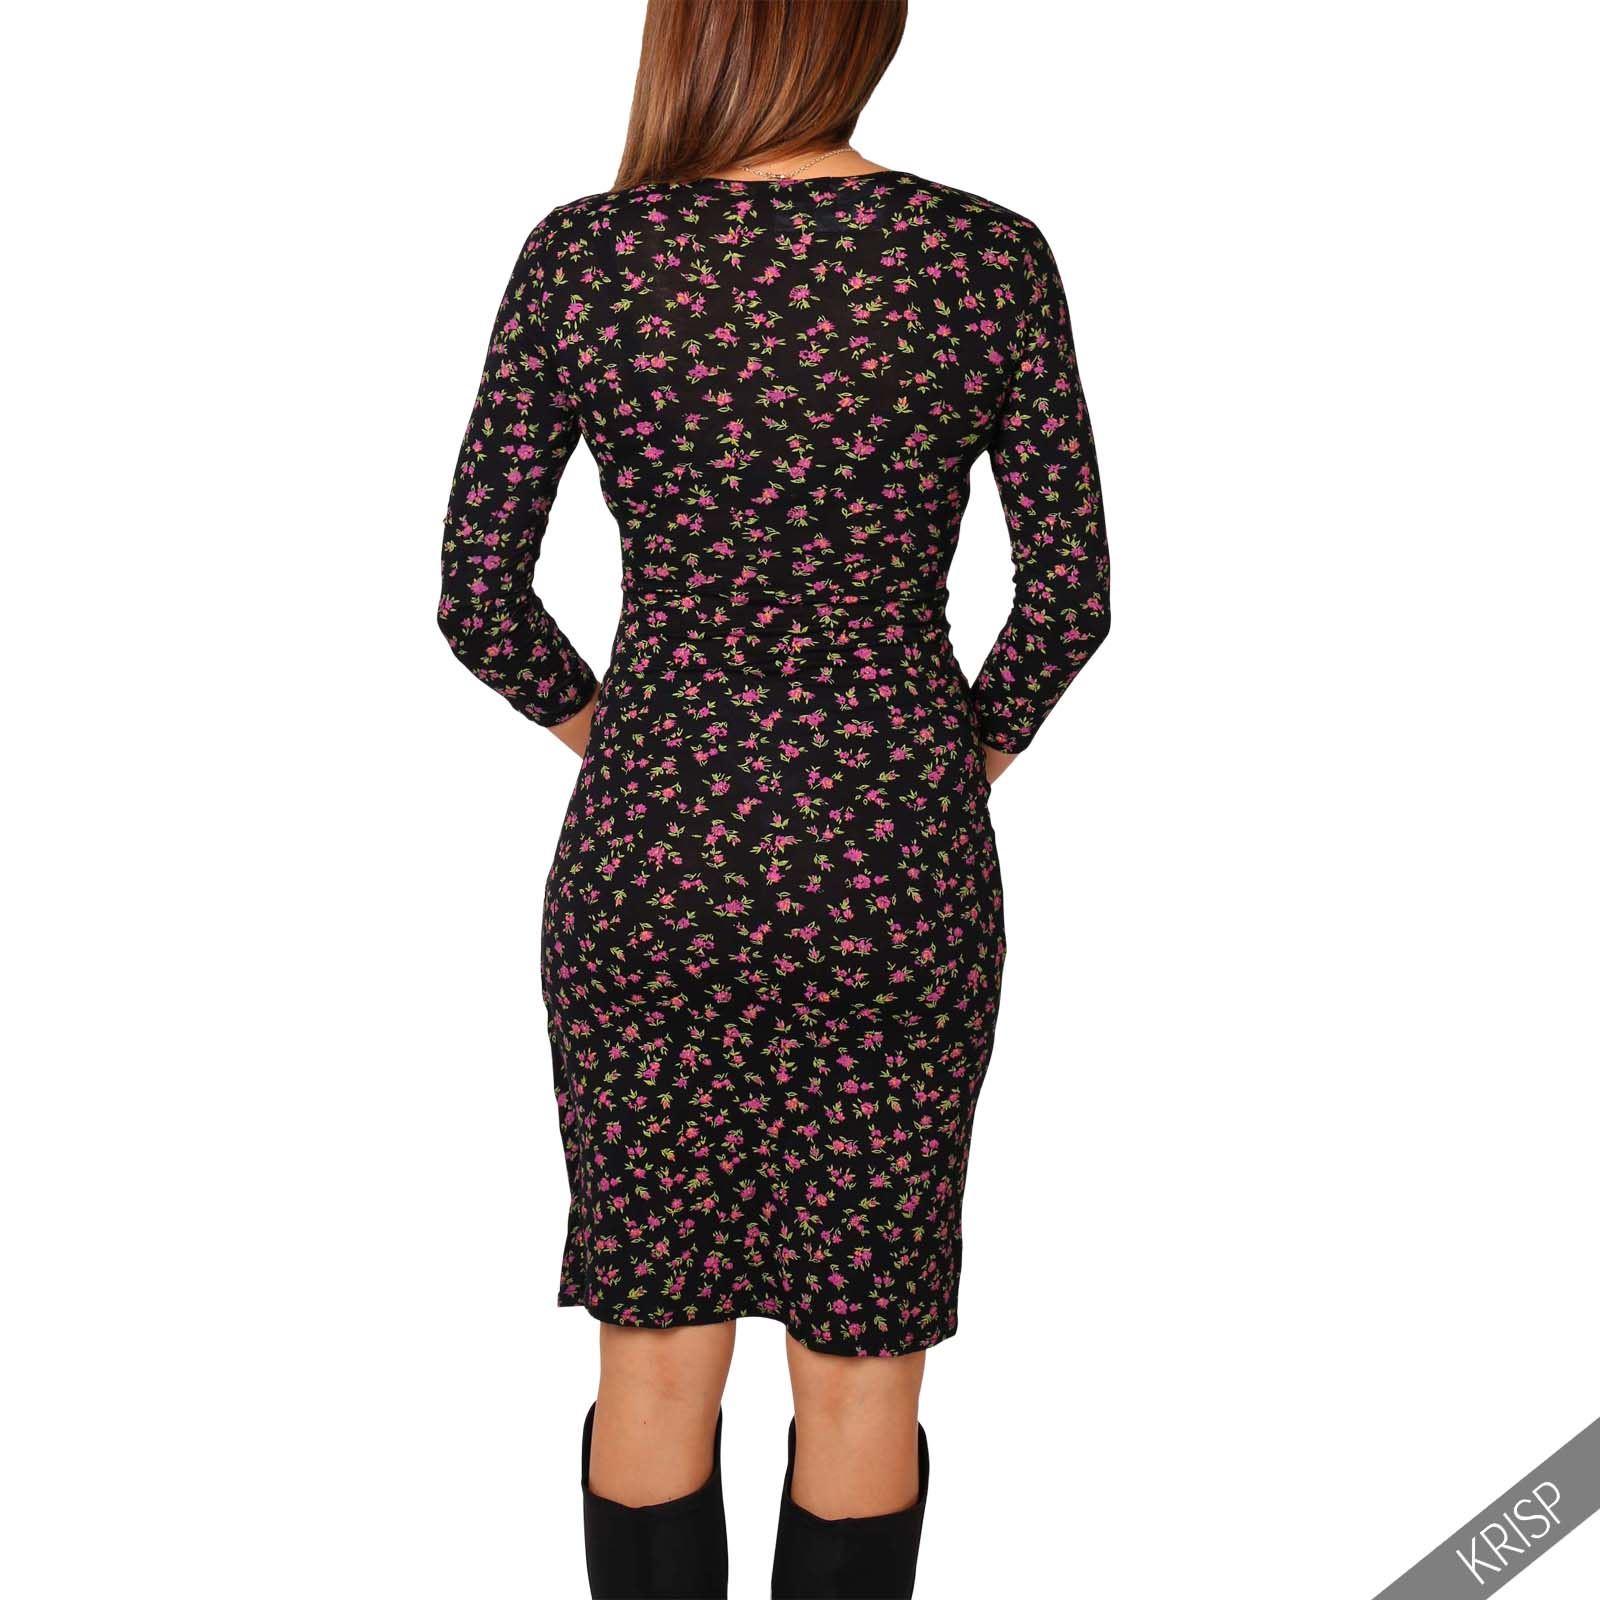 damen knielanges wickelkleid midi kleid v ausschnitt gro e gr en 36 46 ebay. Black Bedroom Furniture Sets. Home Design Ideas